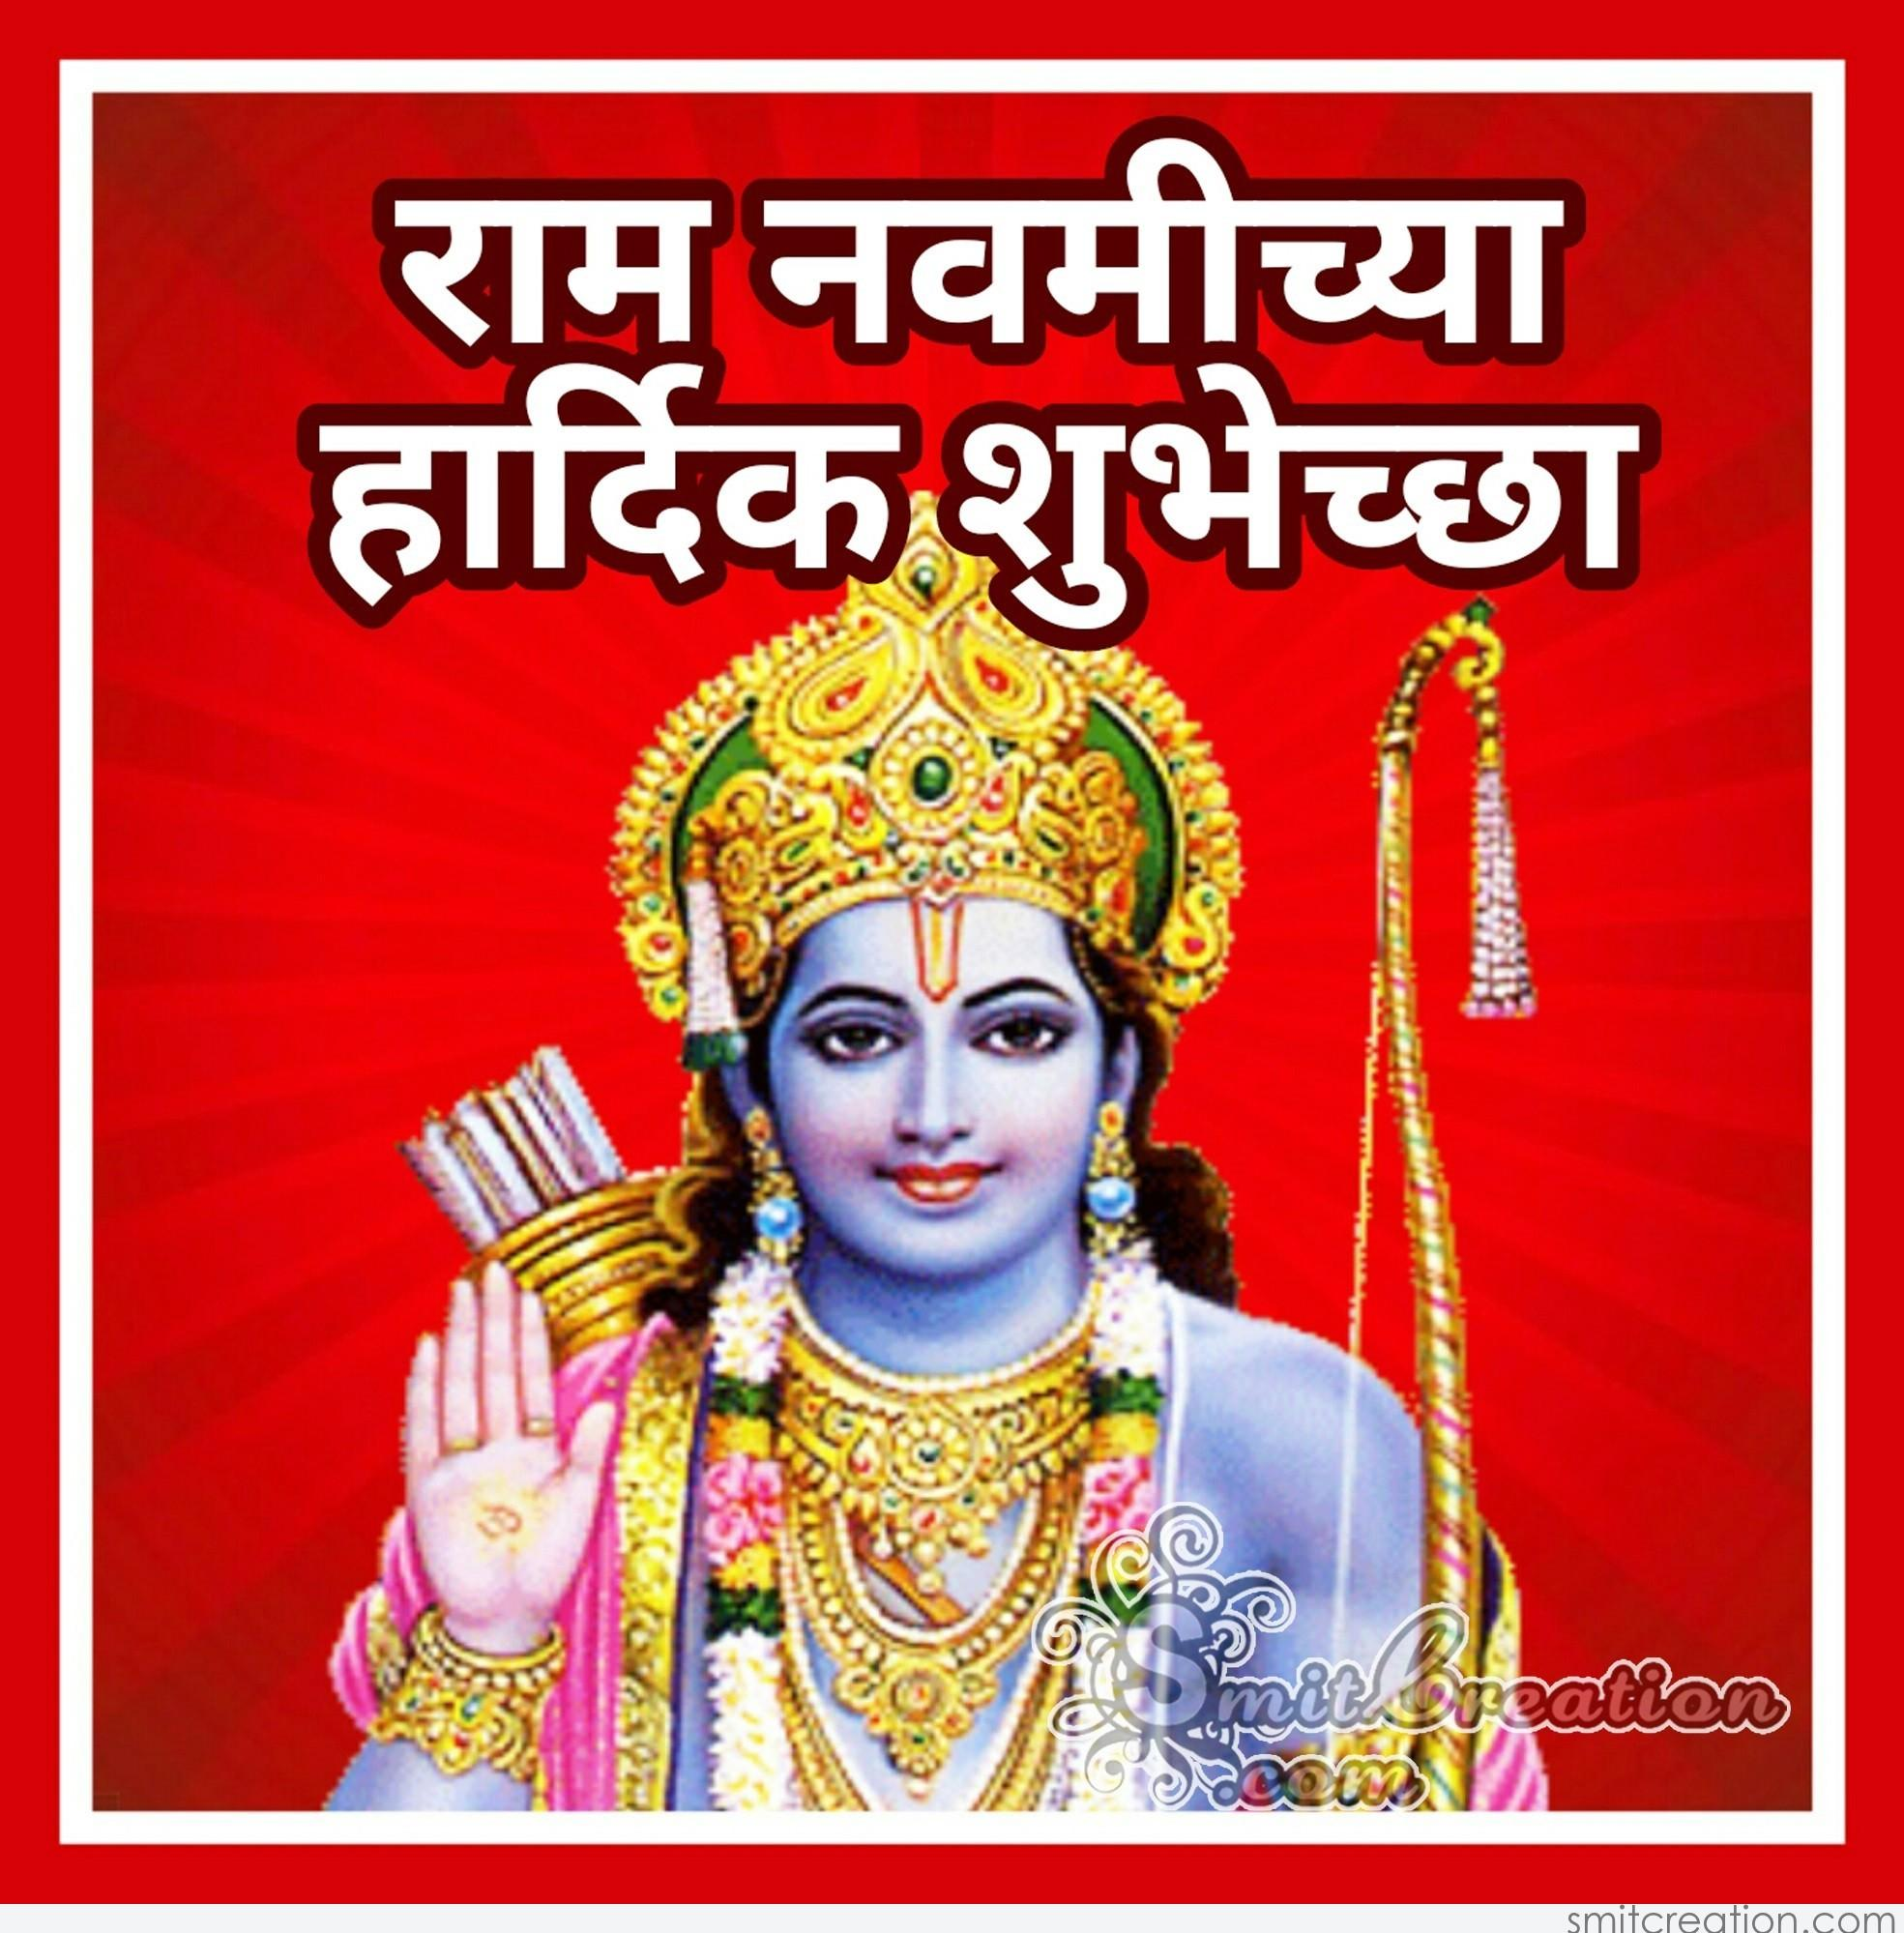 Ram Navmi Chya Hardik Shubhechha - SmitCreation.com Vadhdivas Chya Hardik Shubhechha